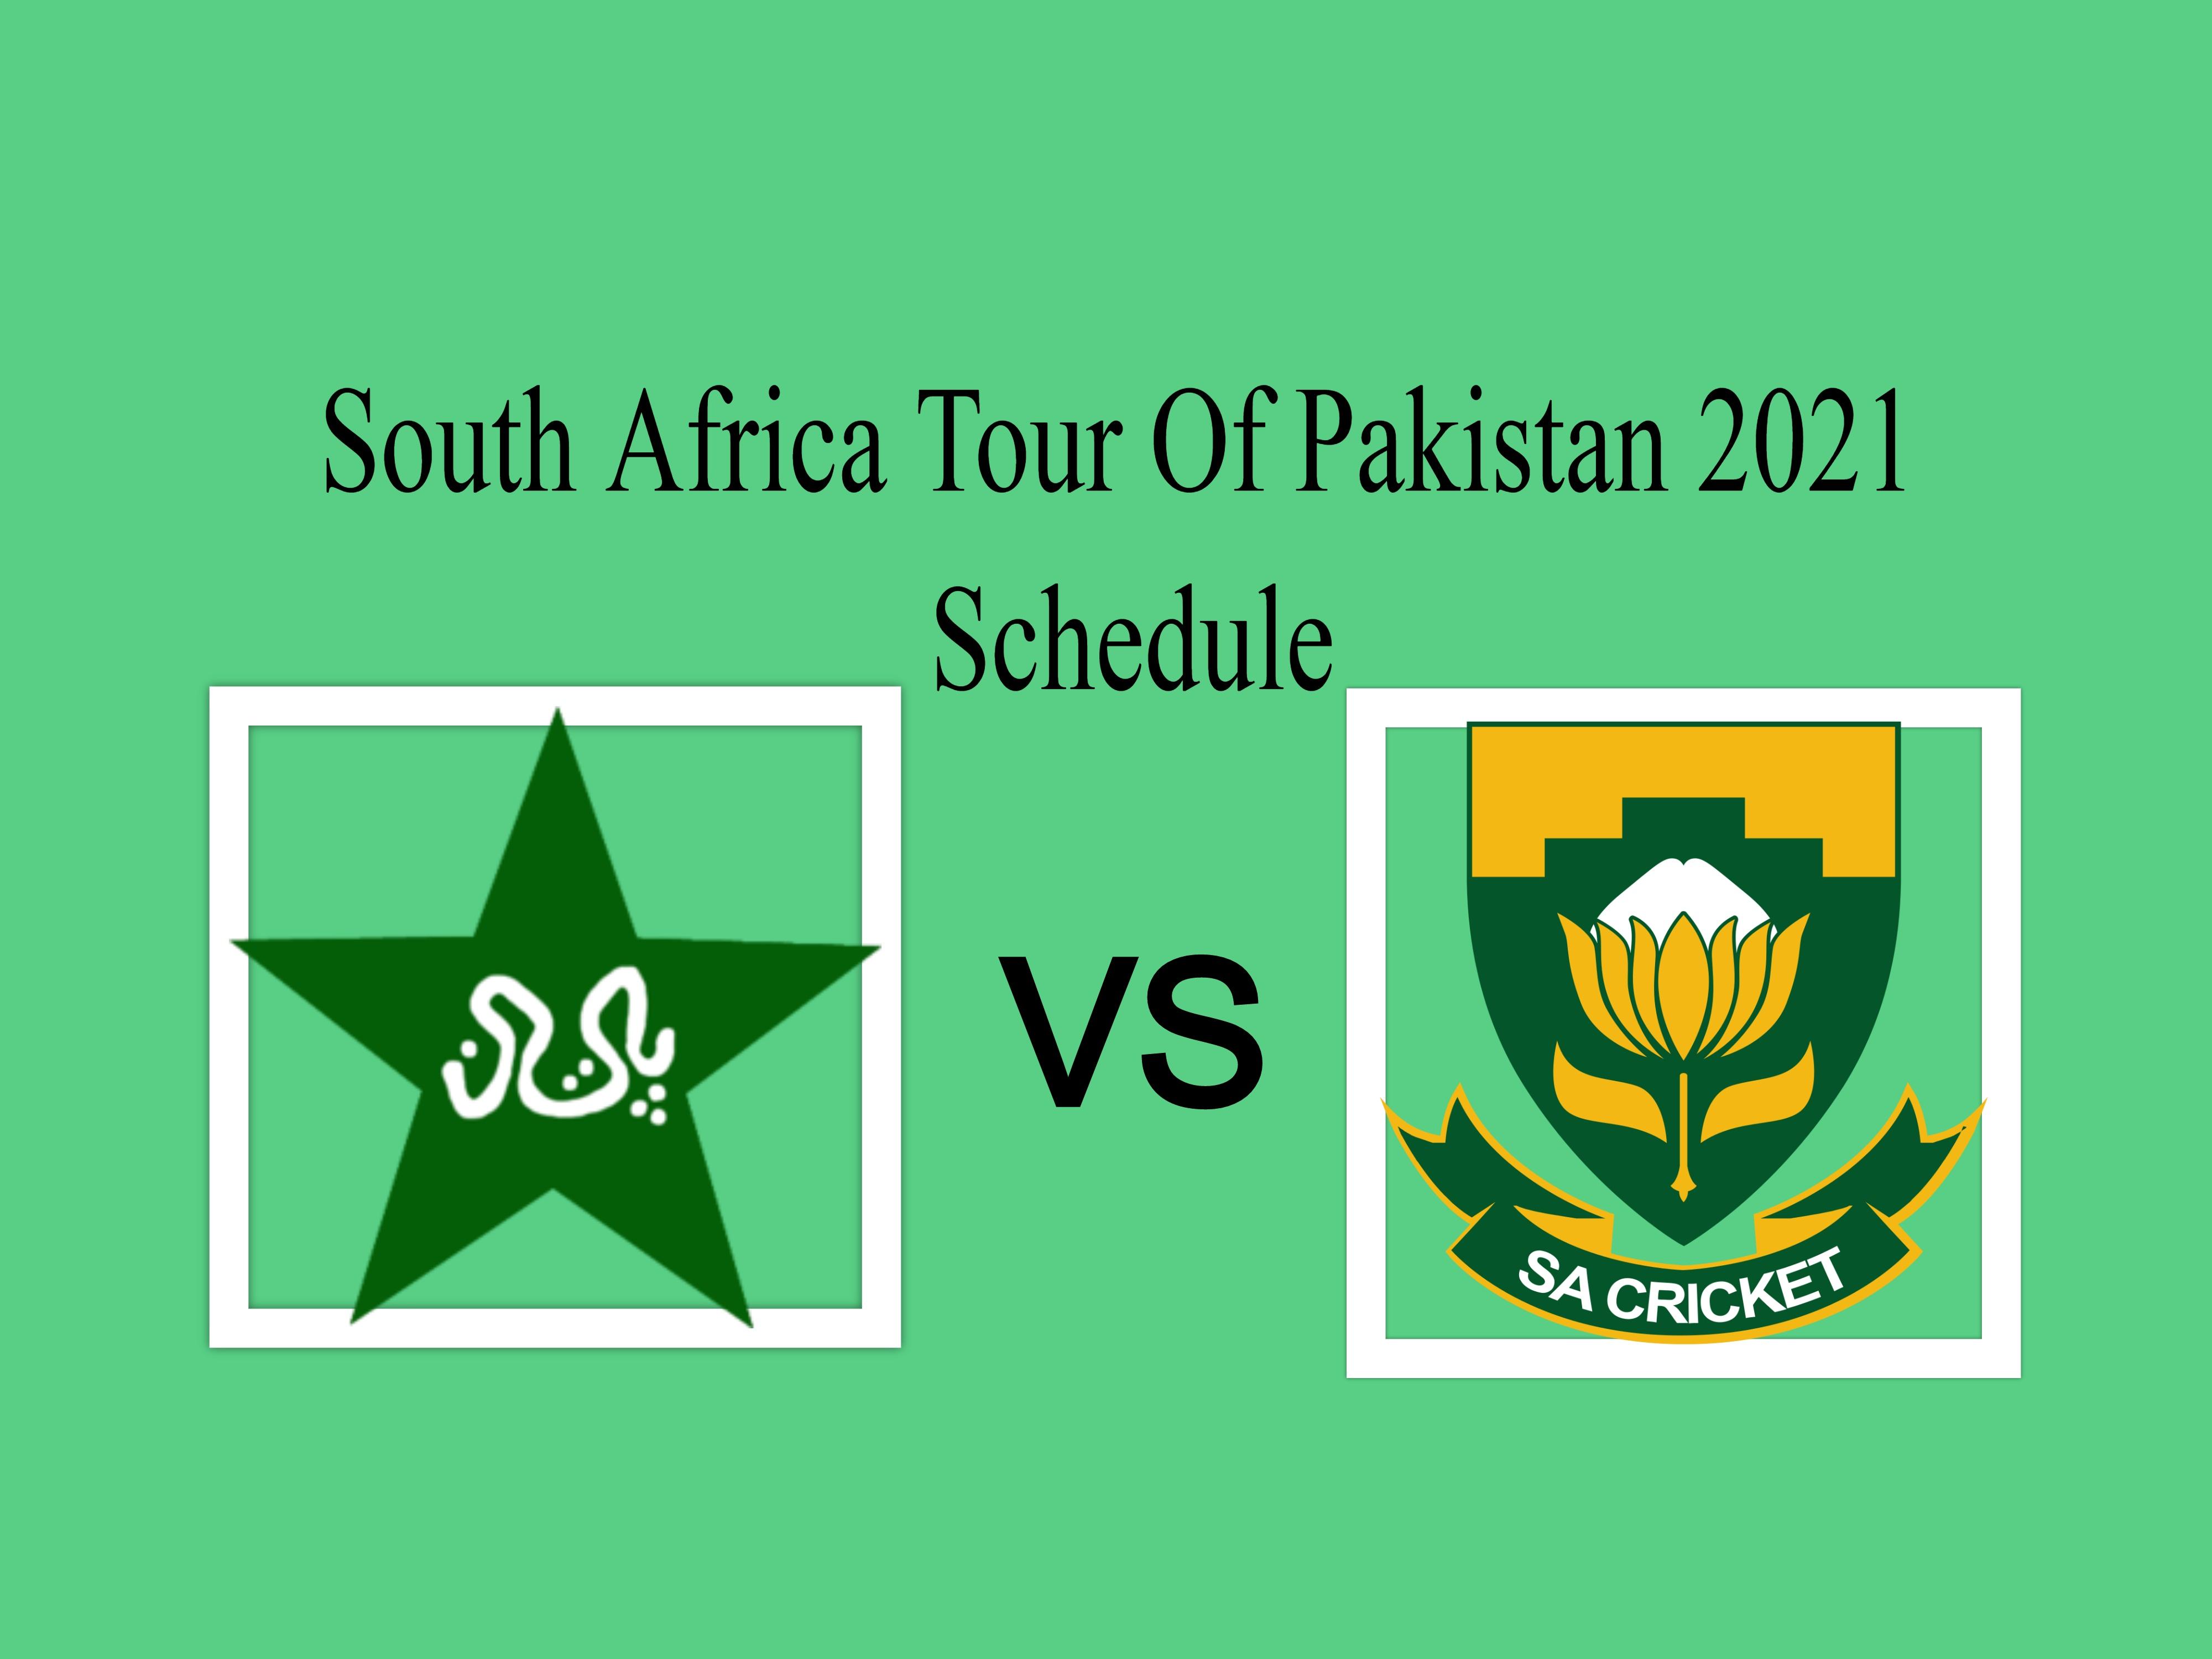 Pakistan vs South Africa 2021Schedule